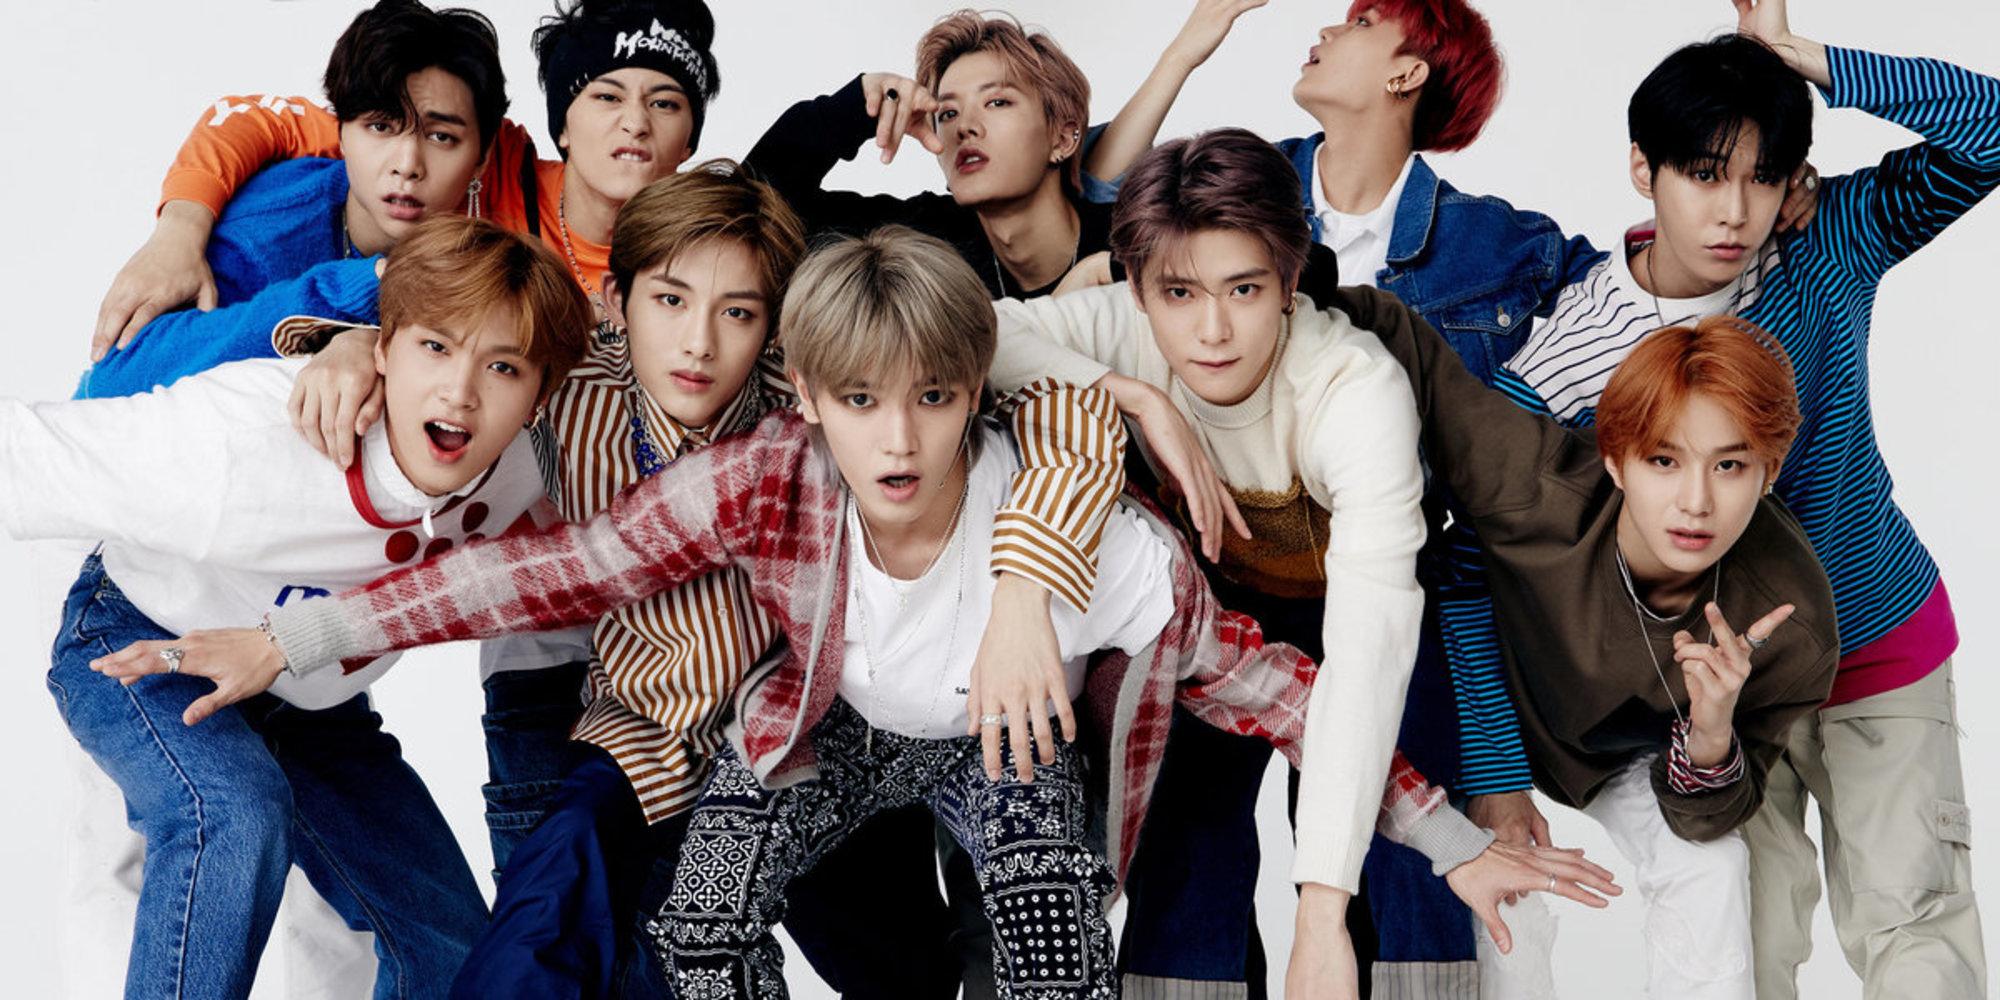 Top 5 Most Popular K-Pop Idol Groups On Kpopmap